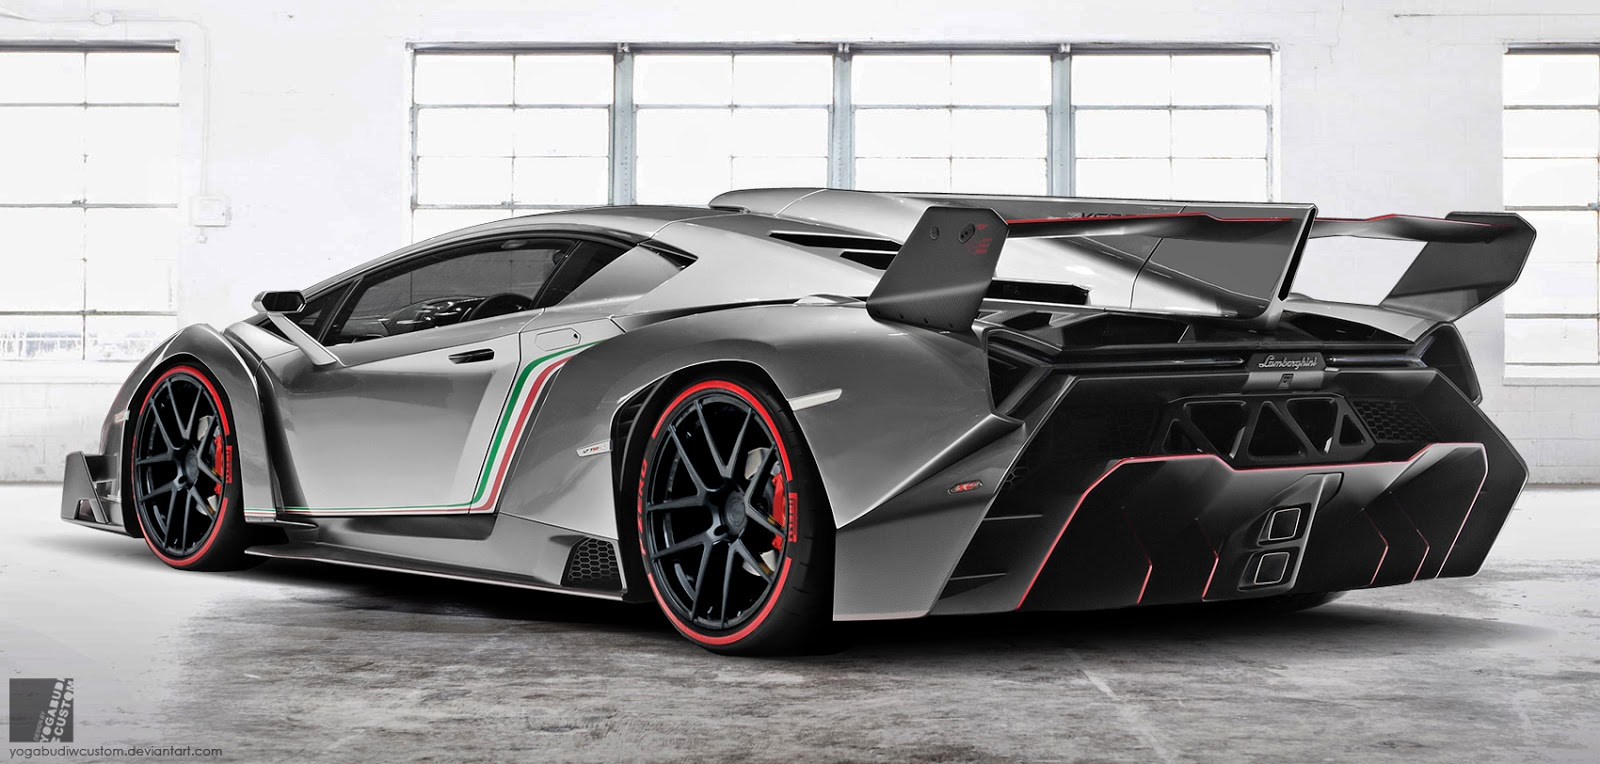 Lamborghini veneno vs lamborghini aventador wide - Lamborghini veneno wallpaper android ...